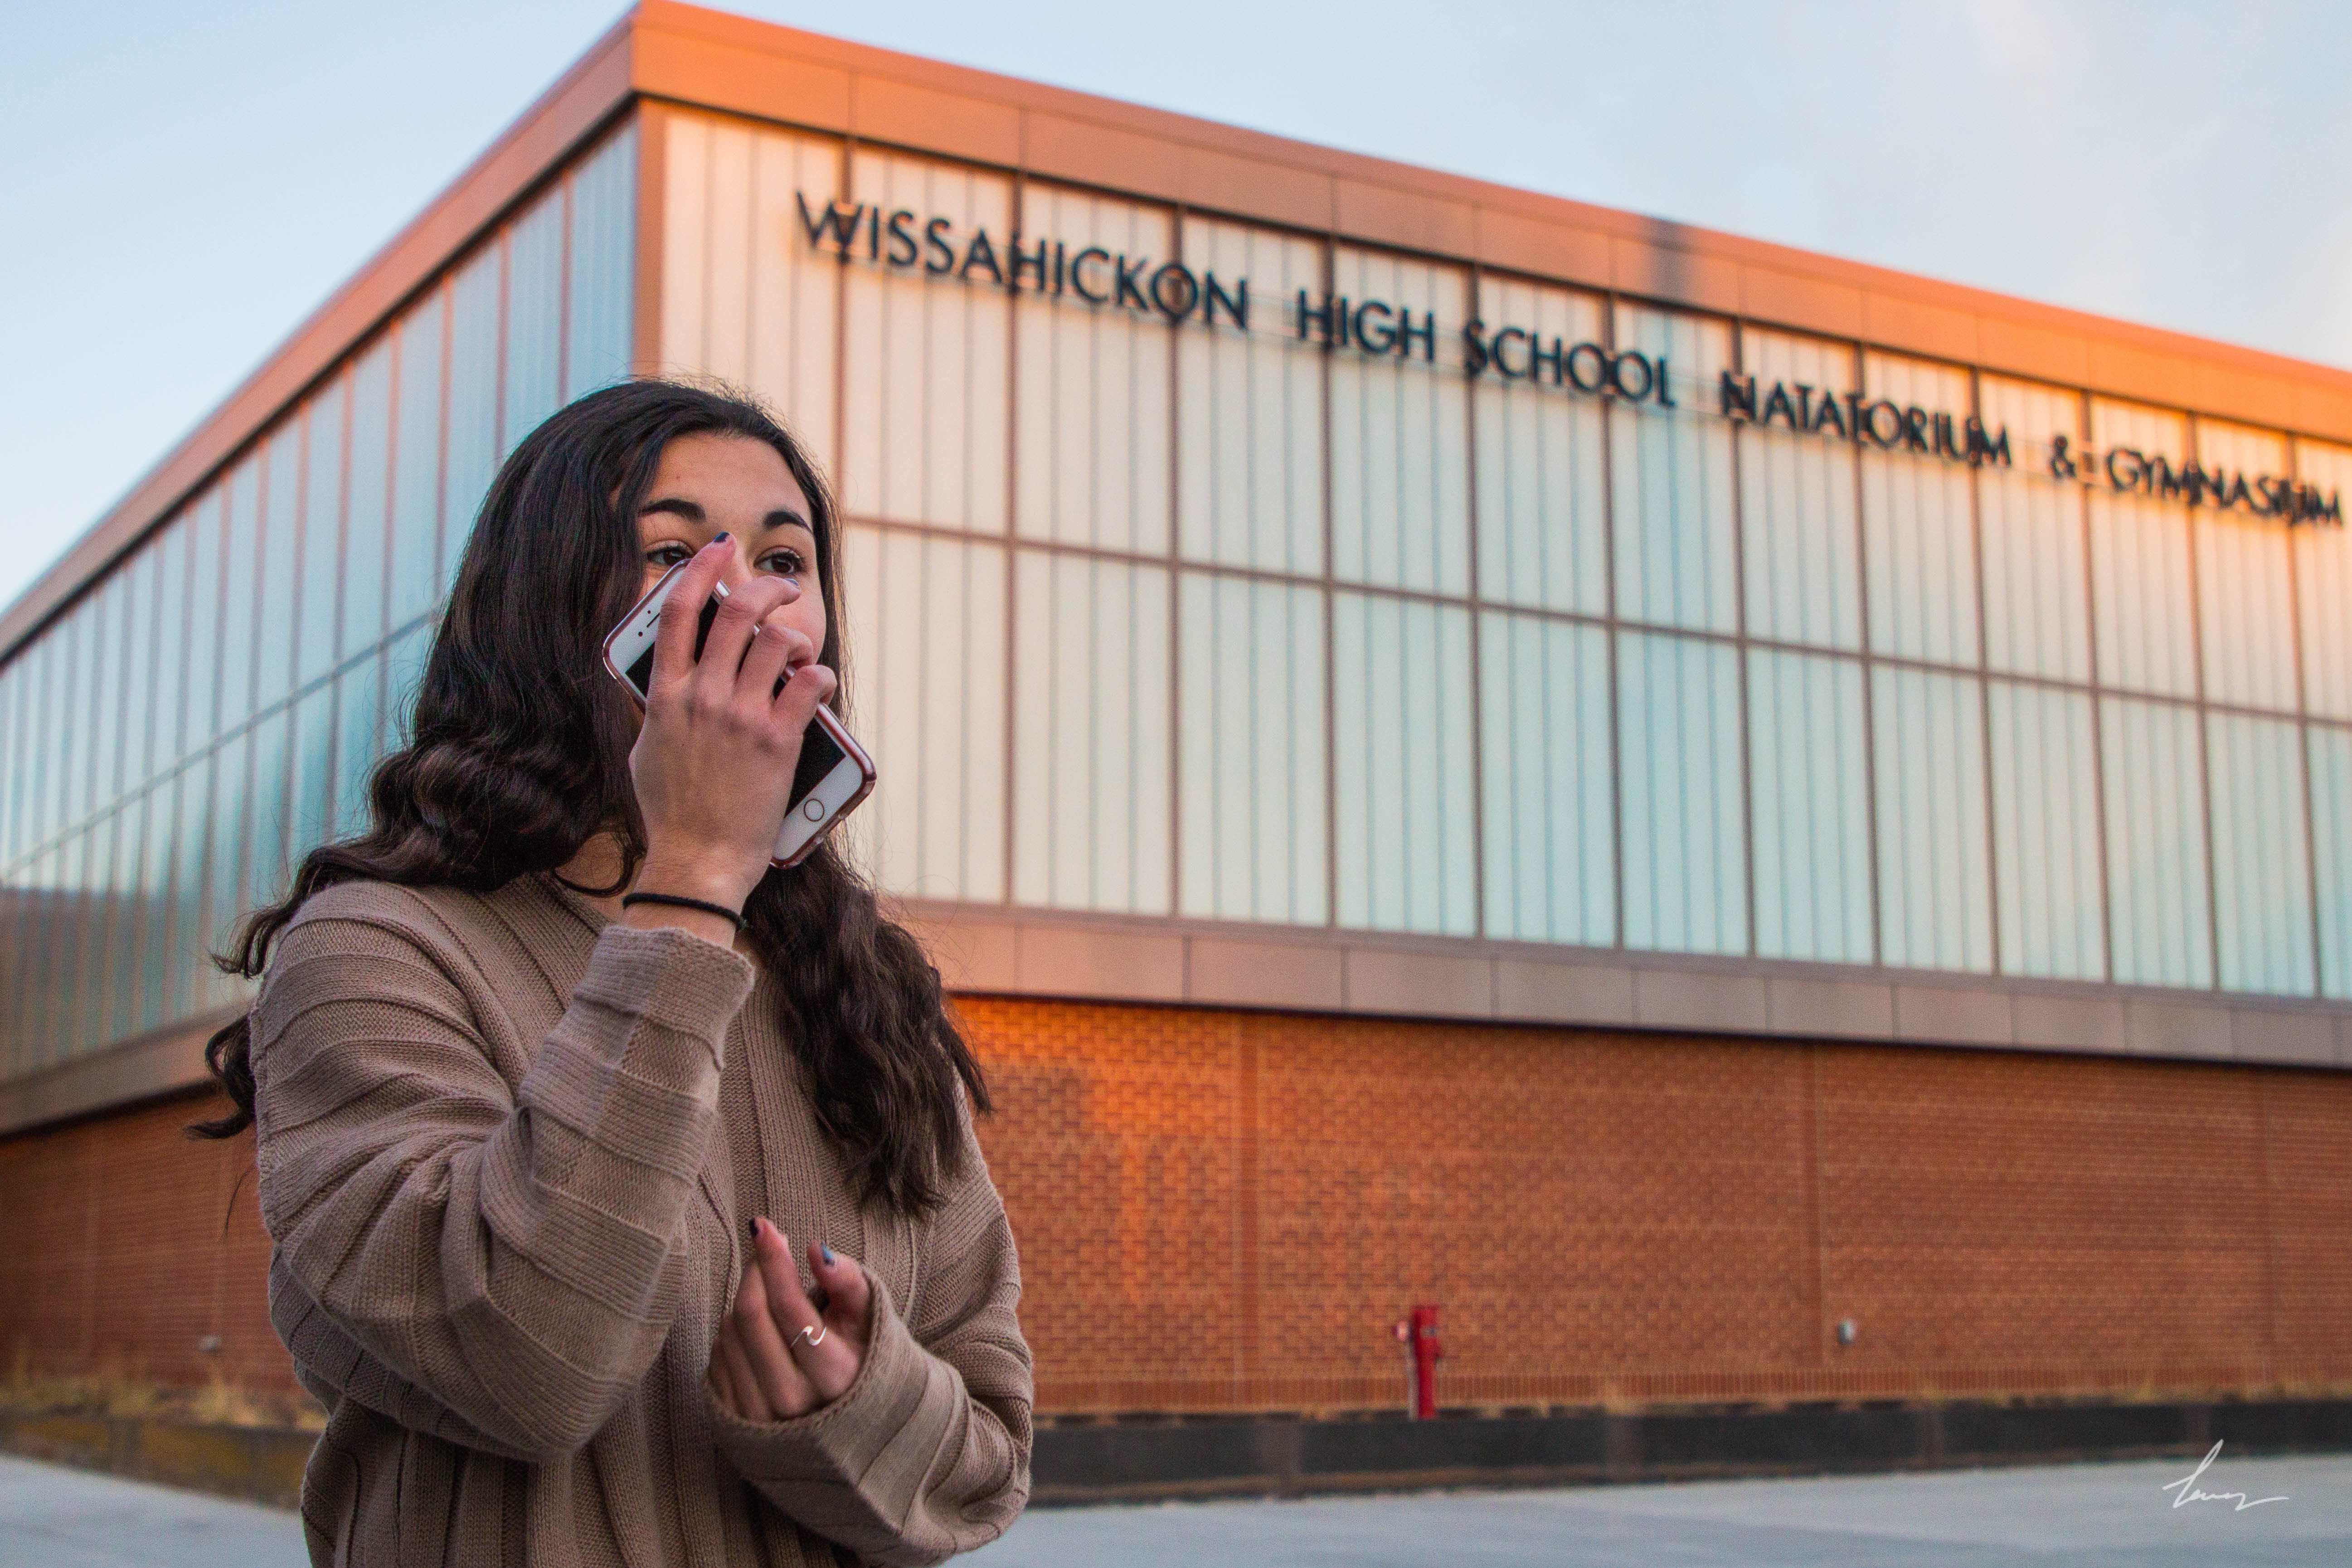 Wissahickon High School - Ambler, Pennsylvania